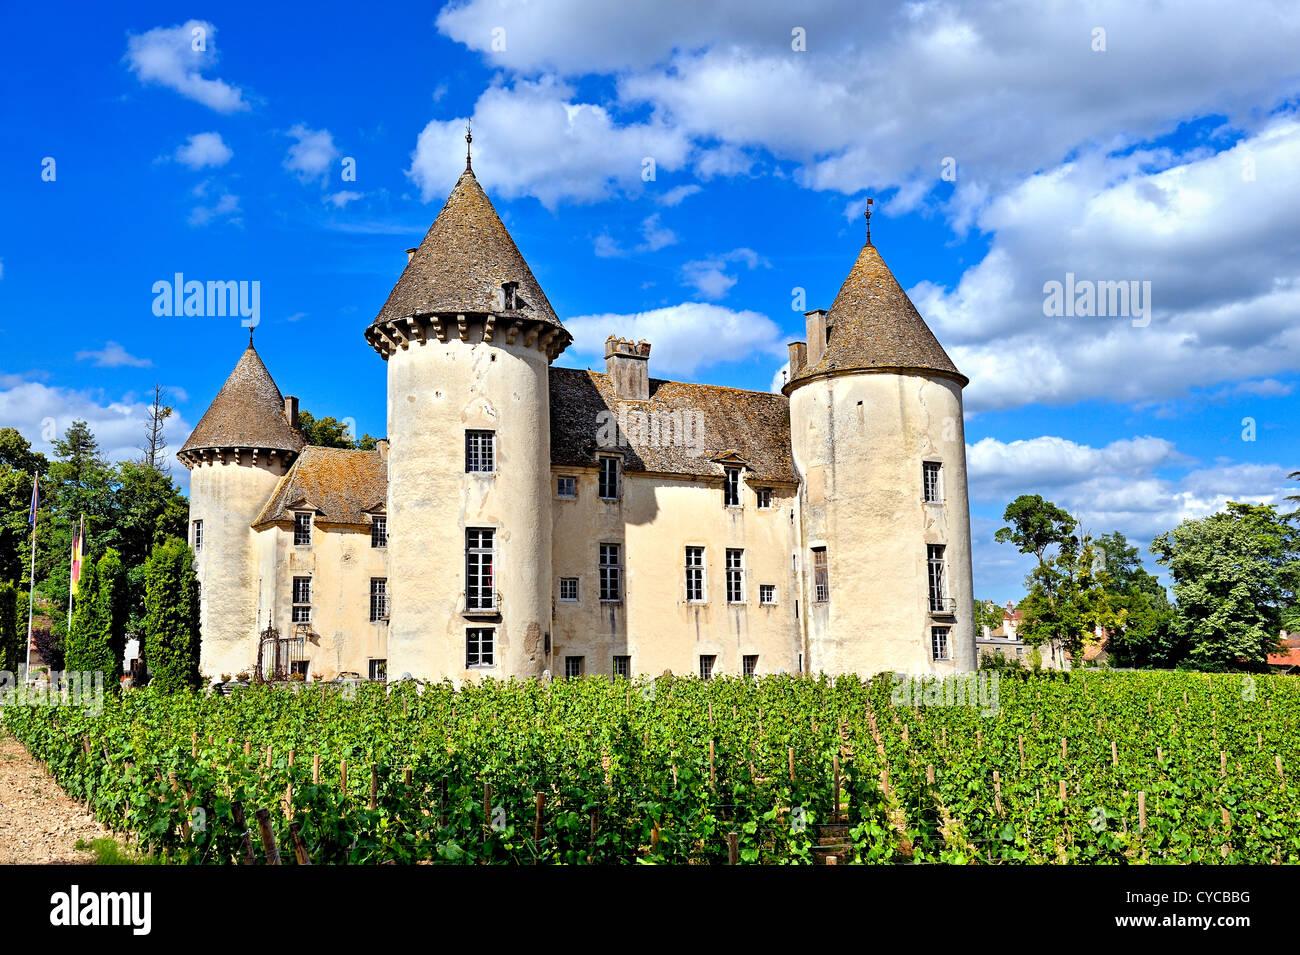 Savigny les Beaune castle, burgundy, France. - Stock Image